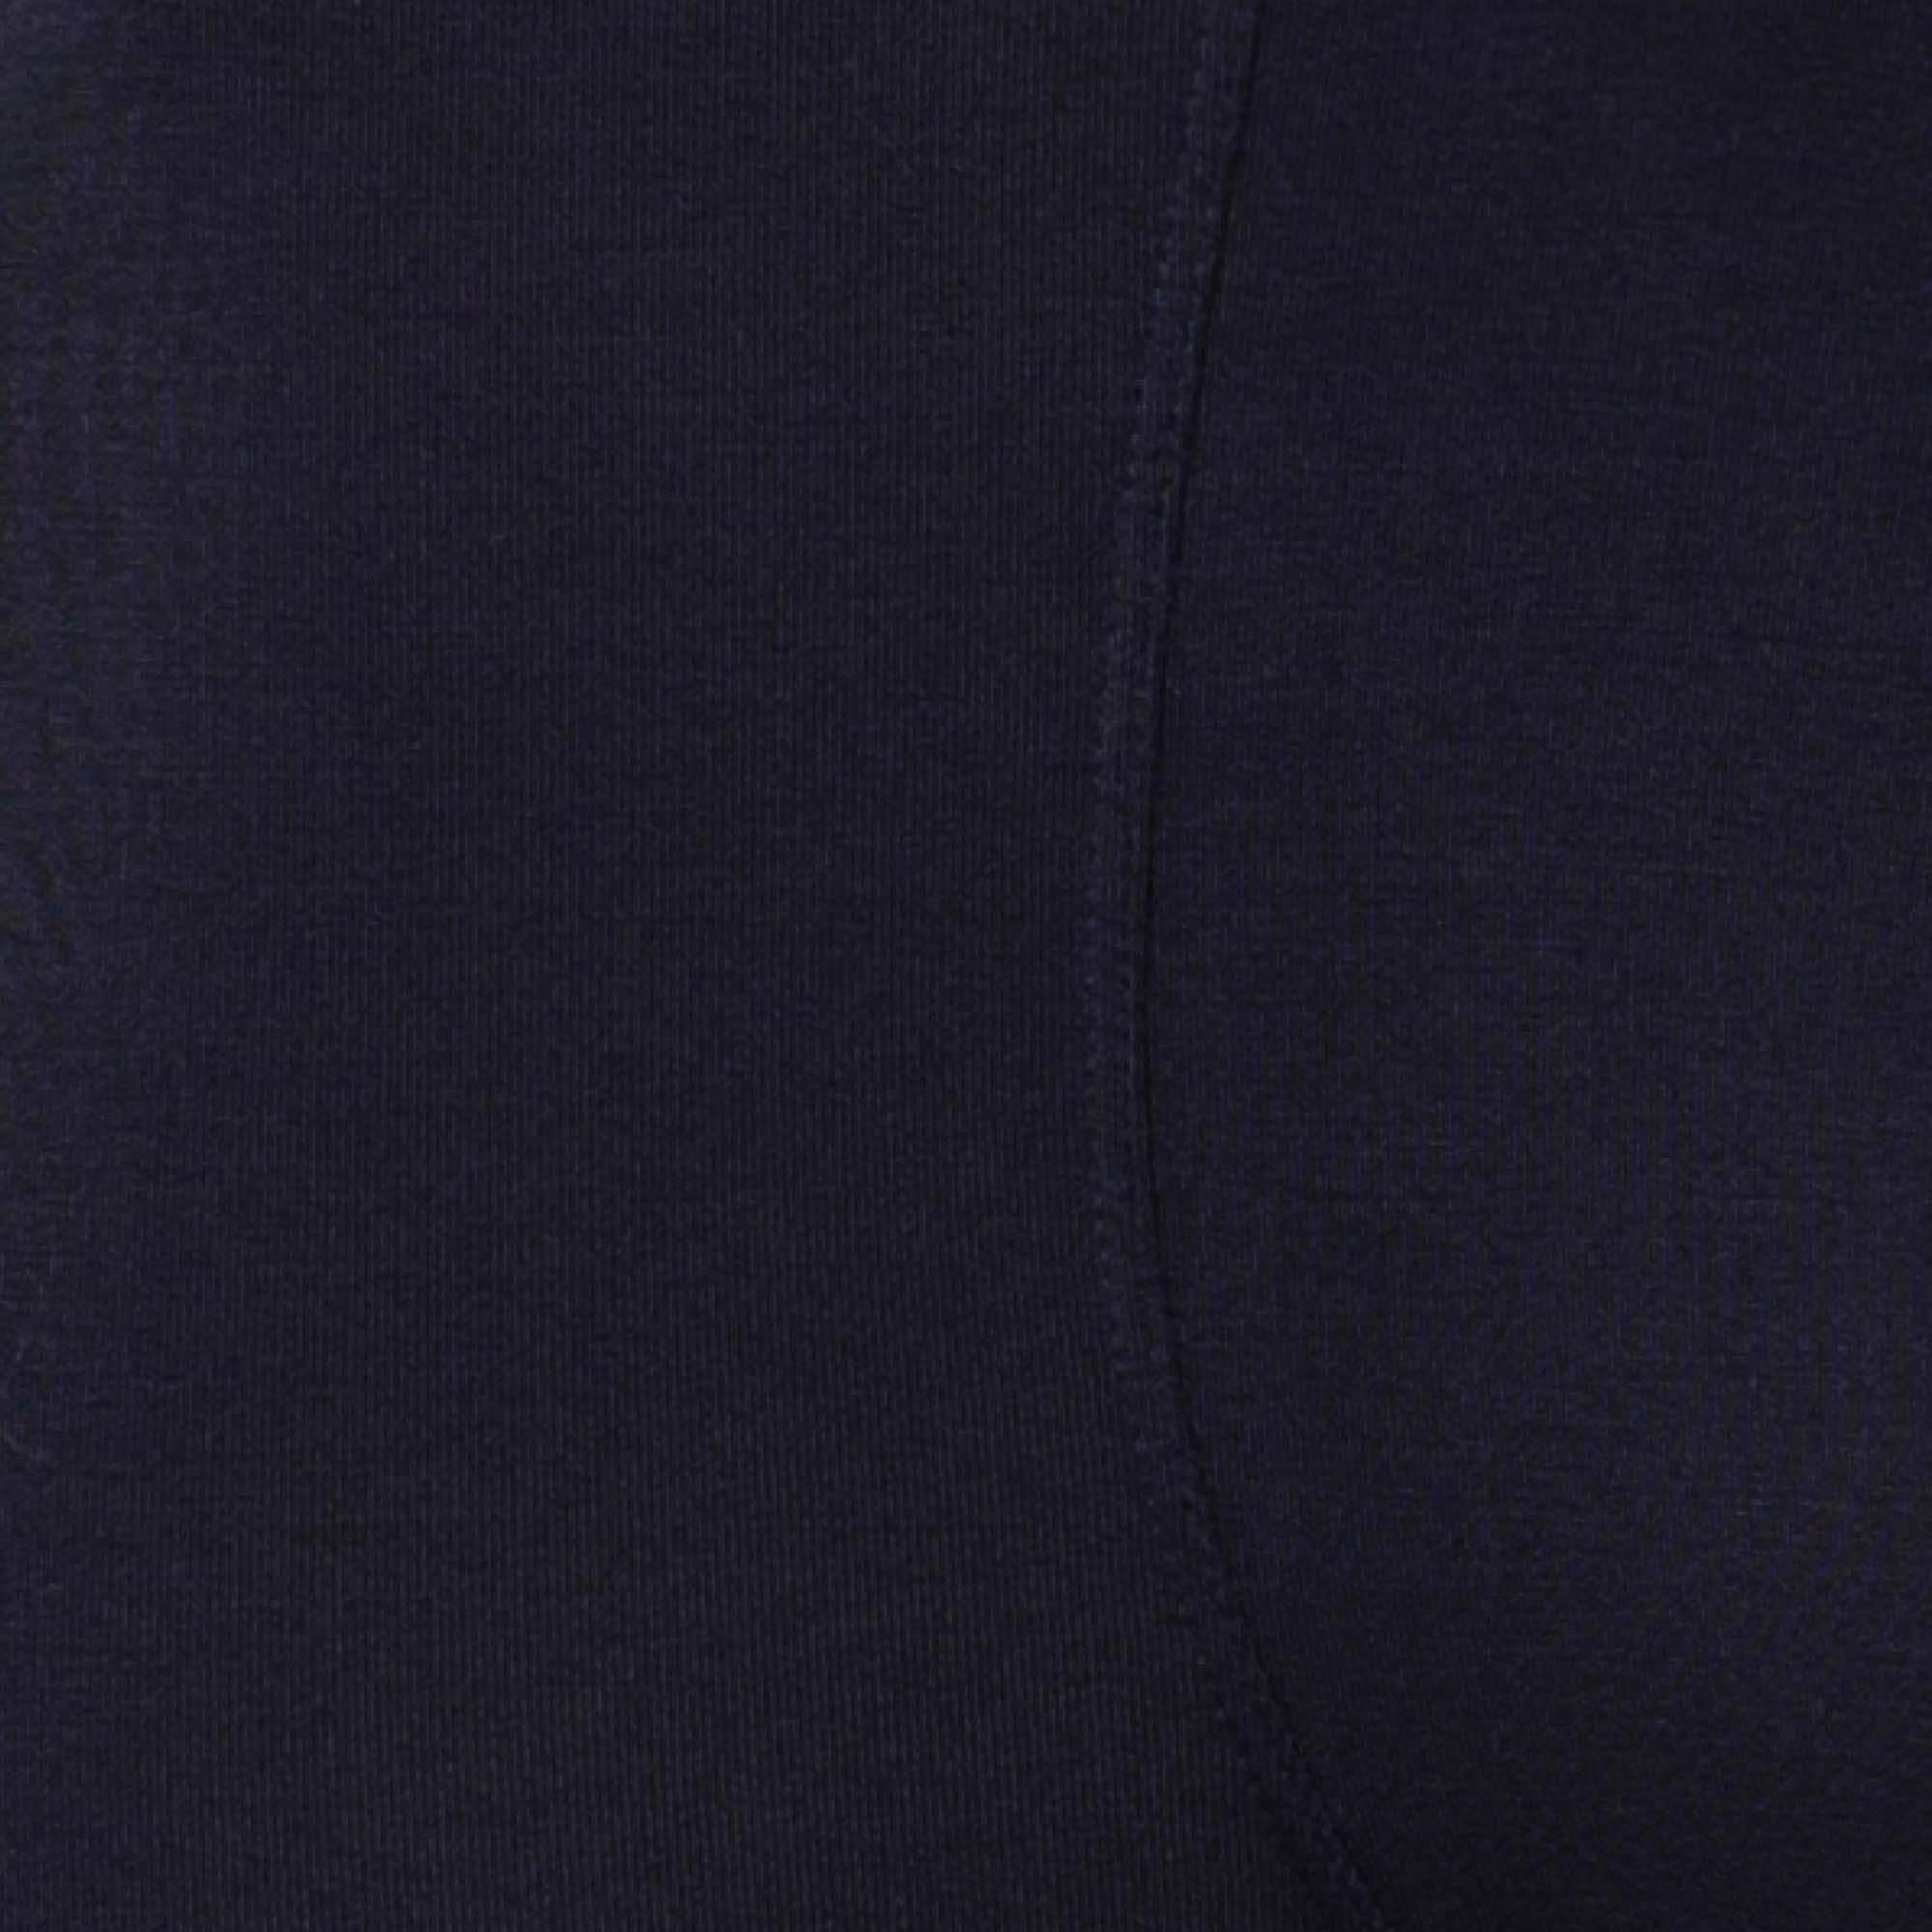 Трусы мужские шорты MH-1058 бамбук